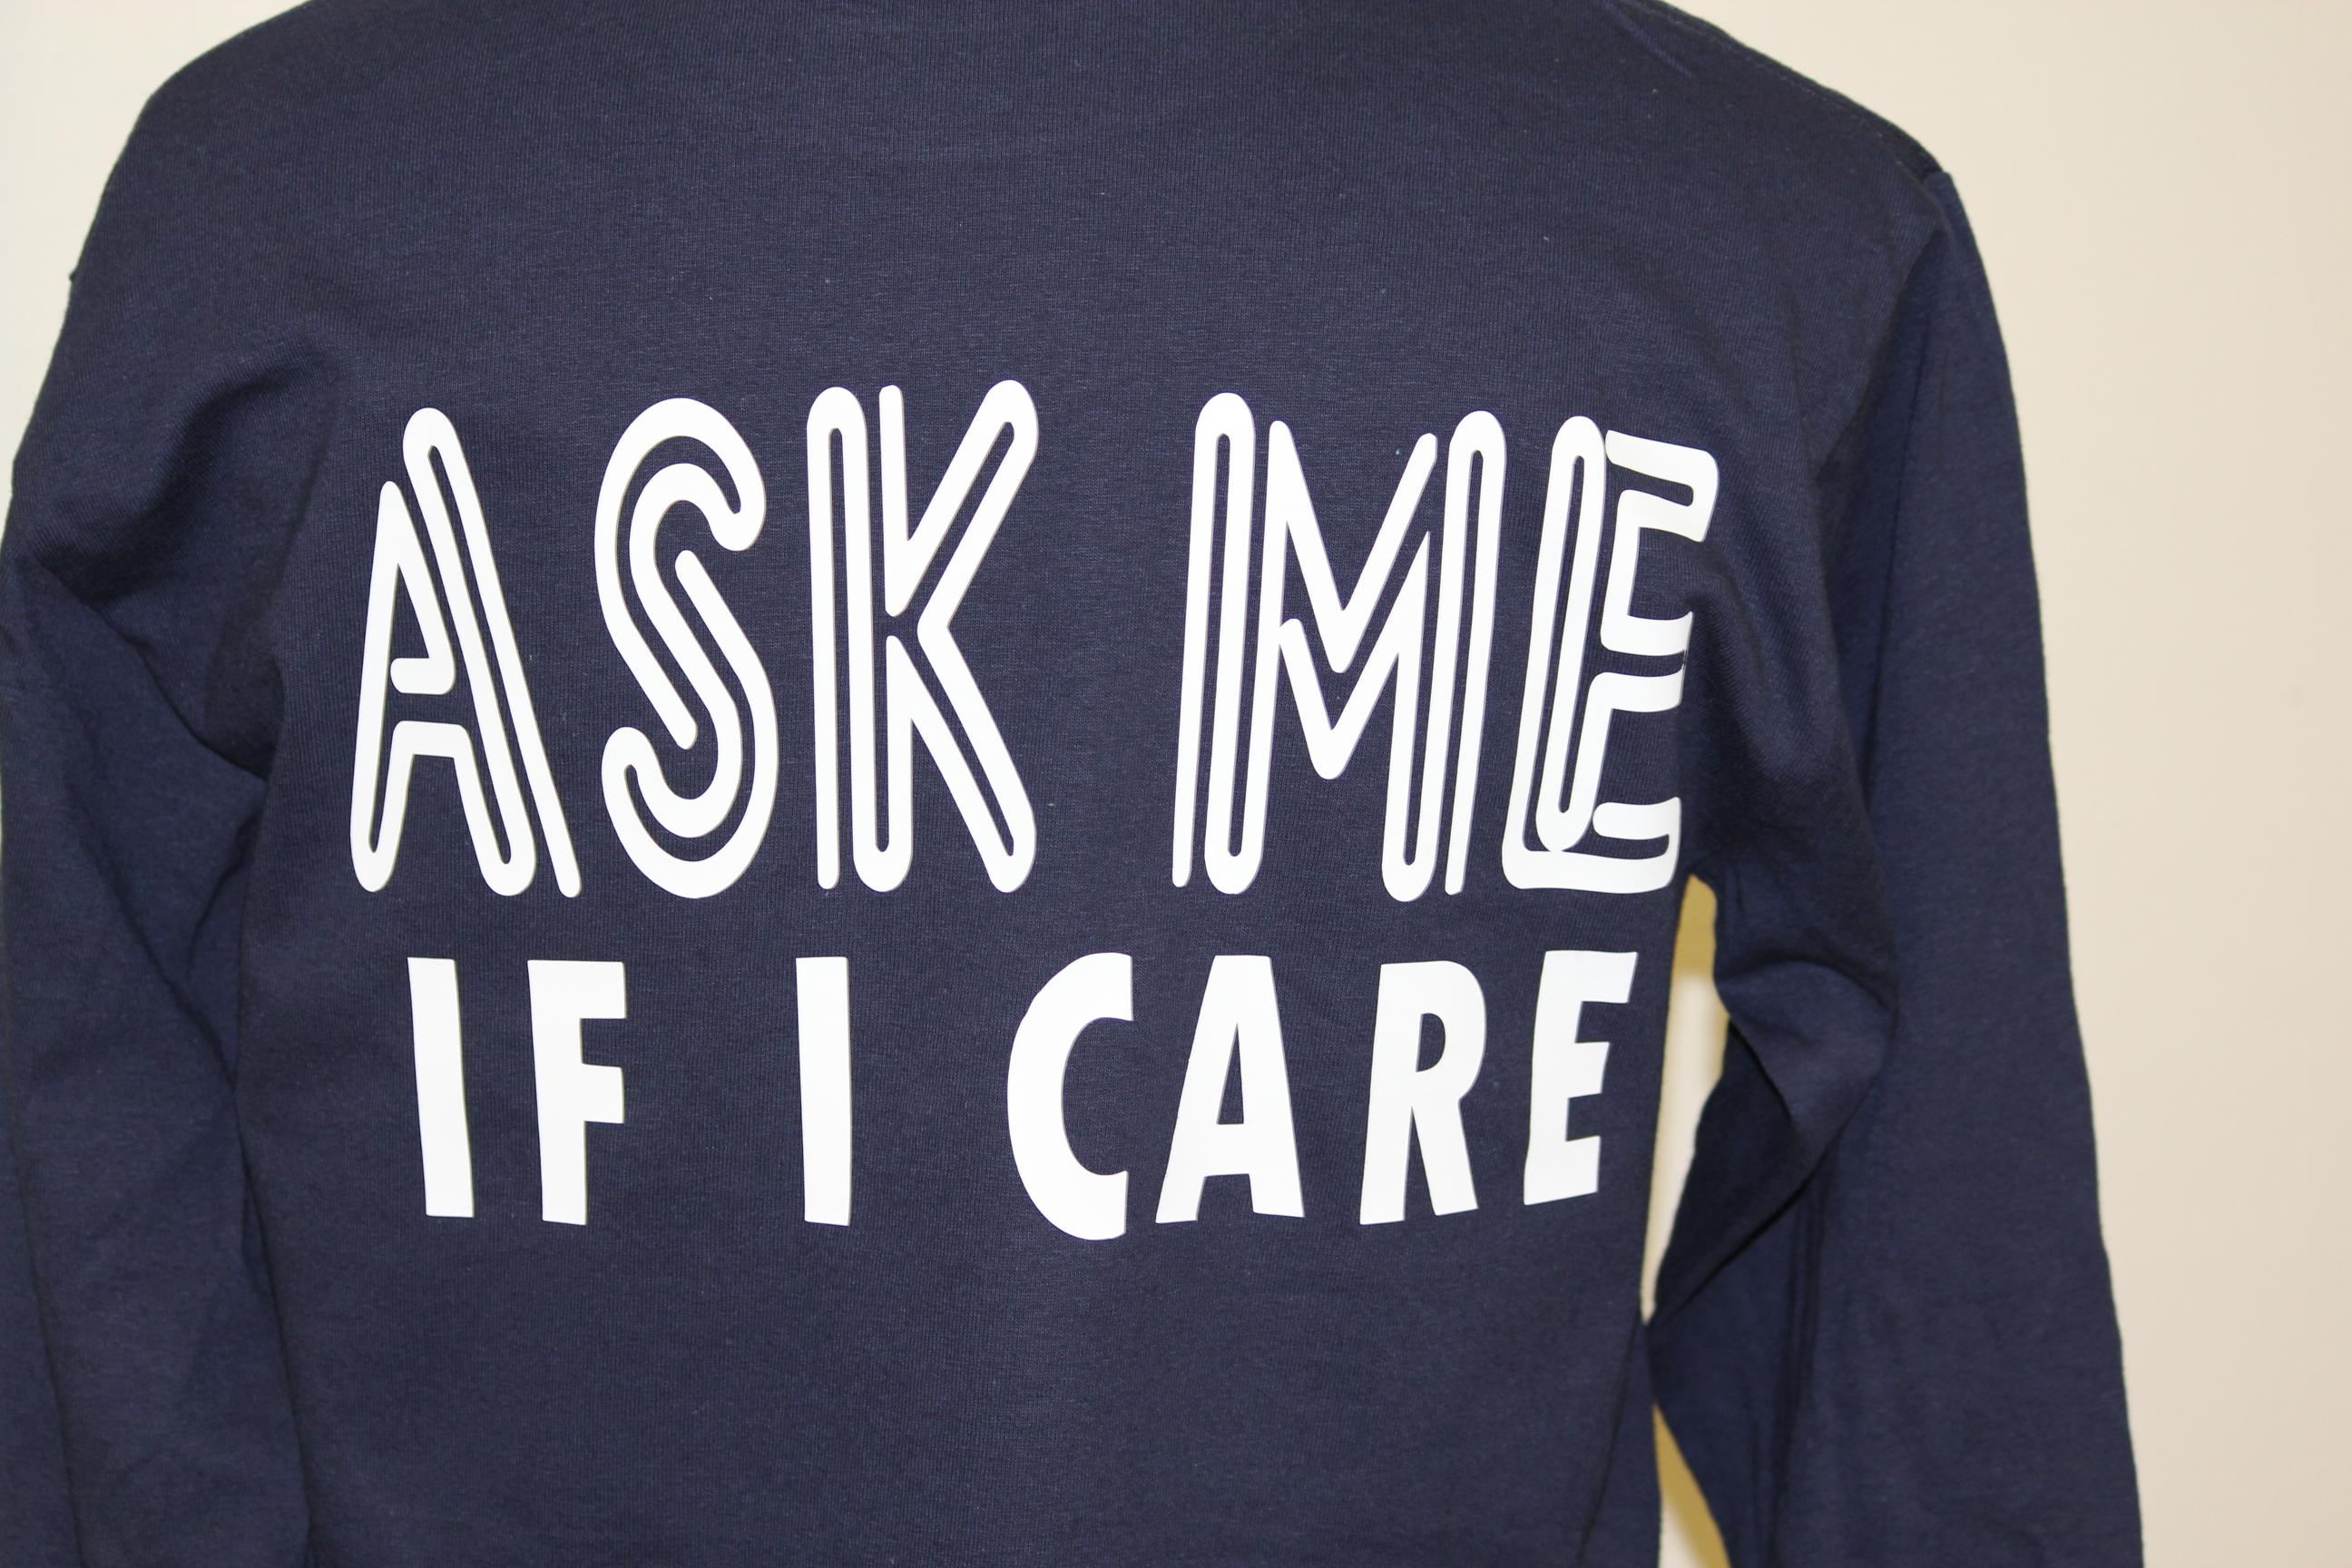 ask-me-if-i-care-shirt.jpg